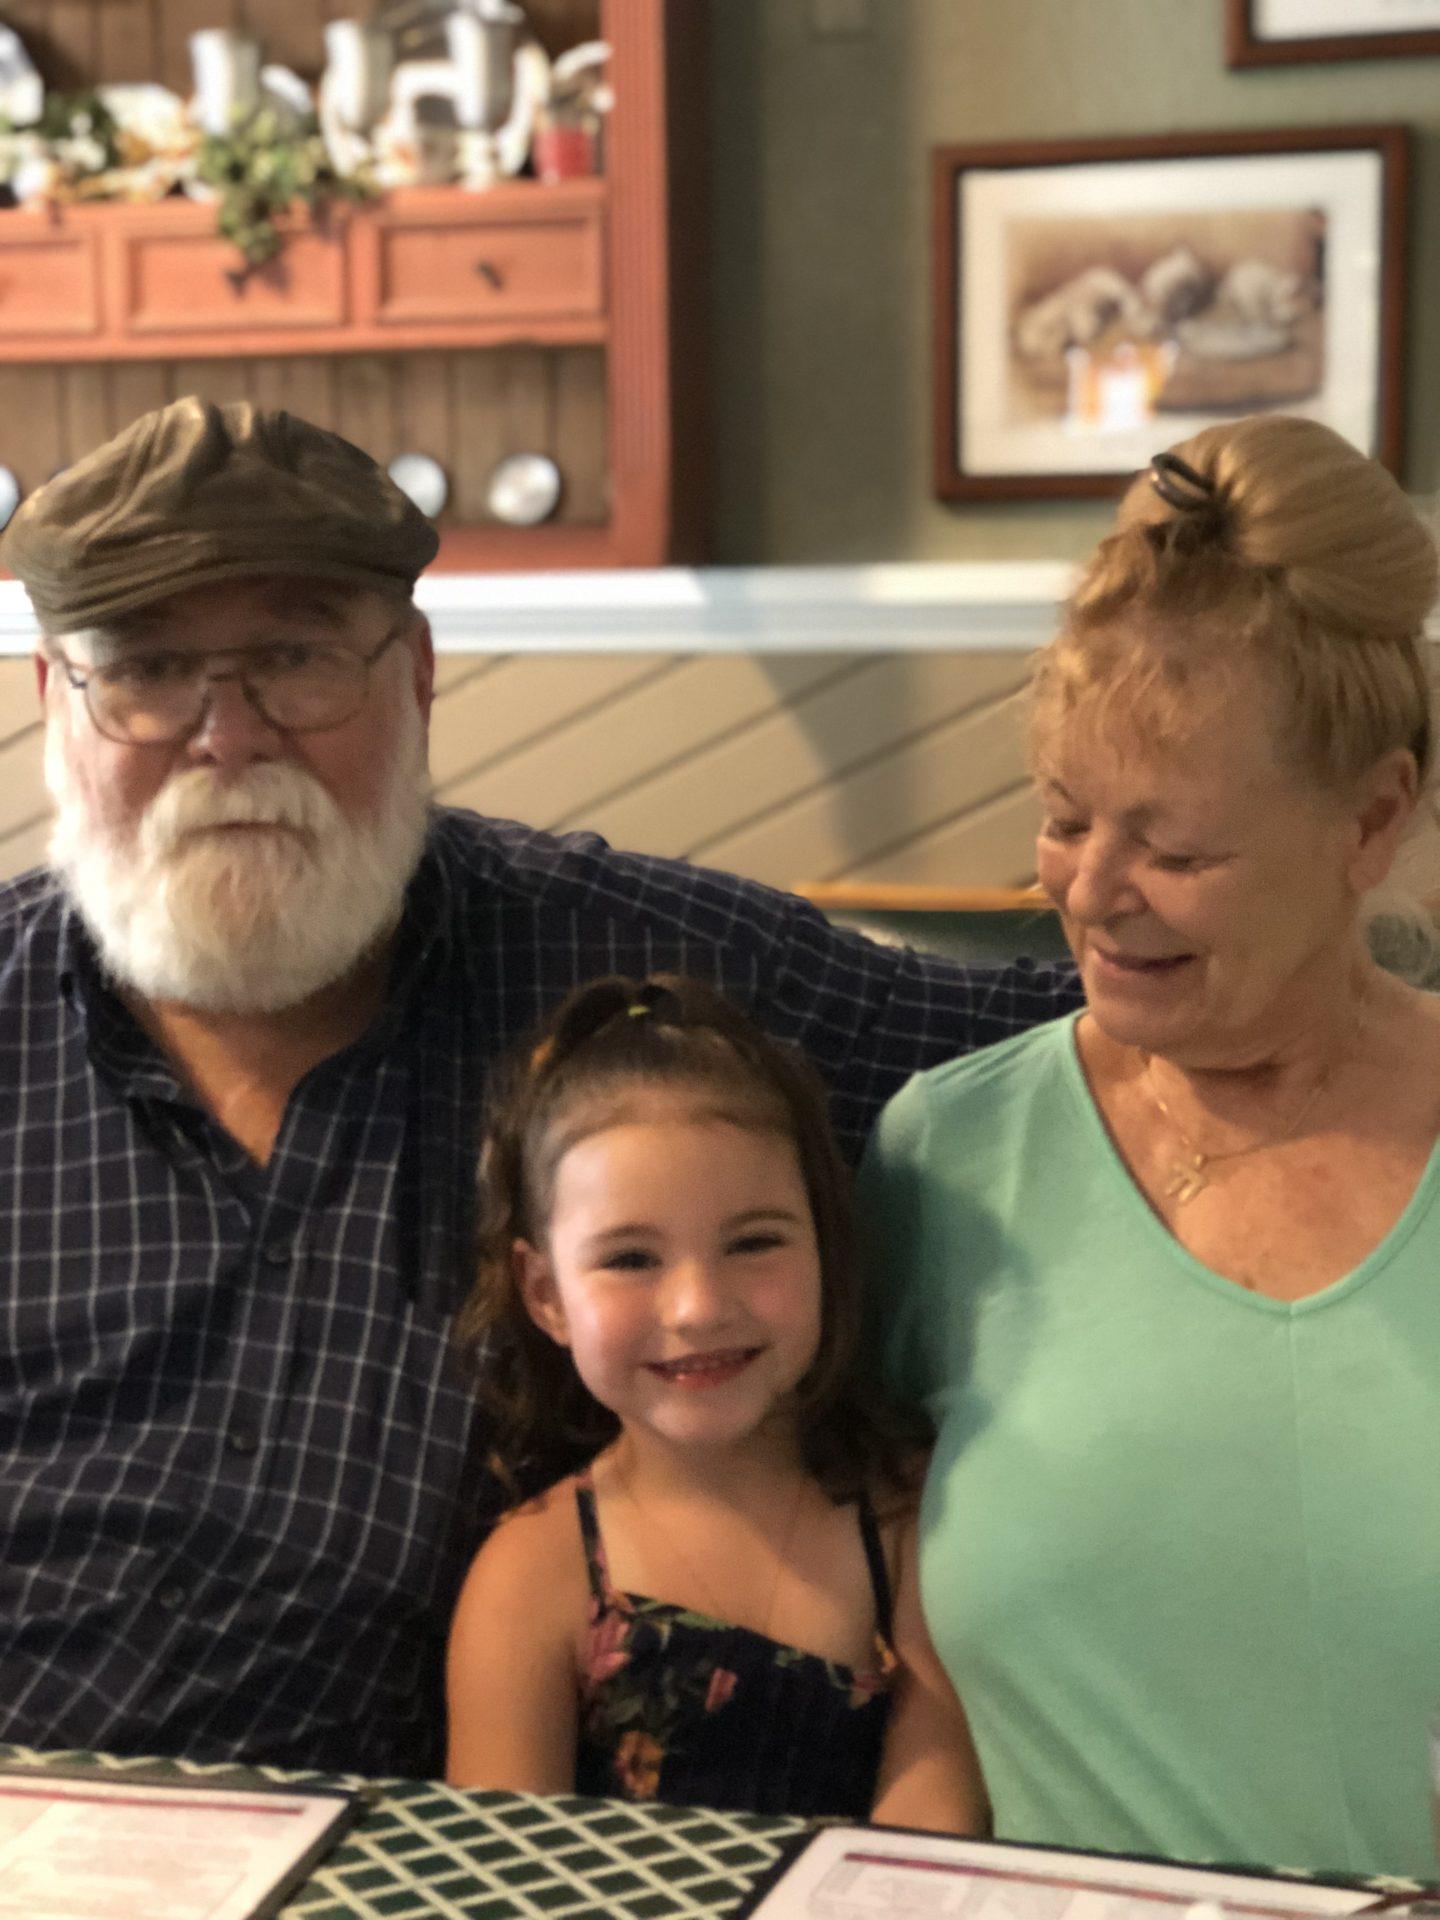 Steve's wife and Granddaughter Ava